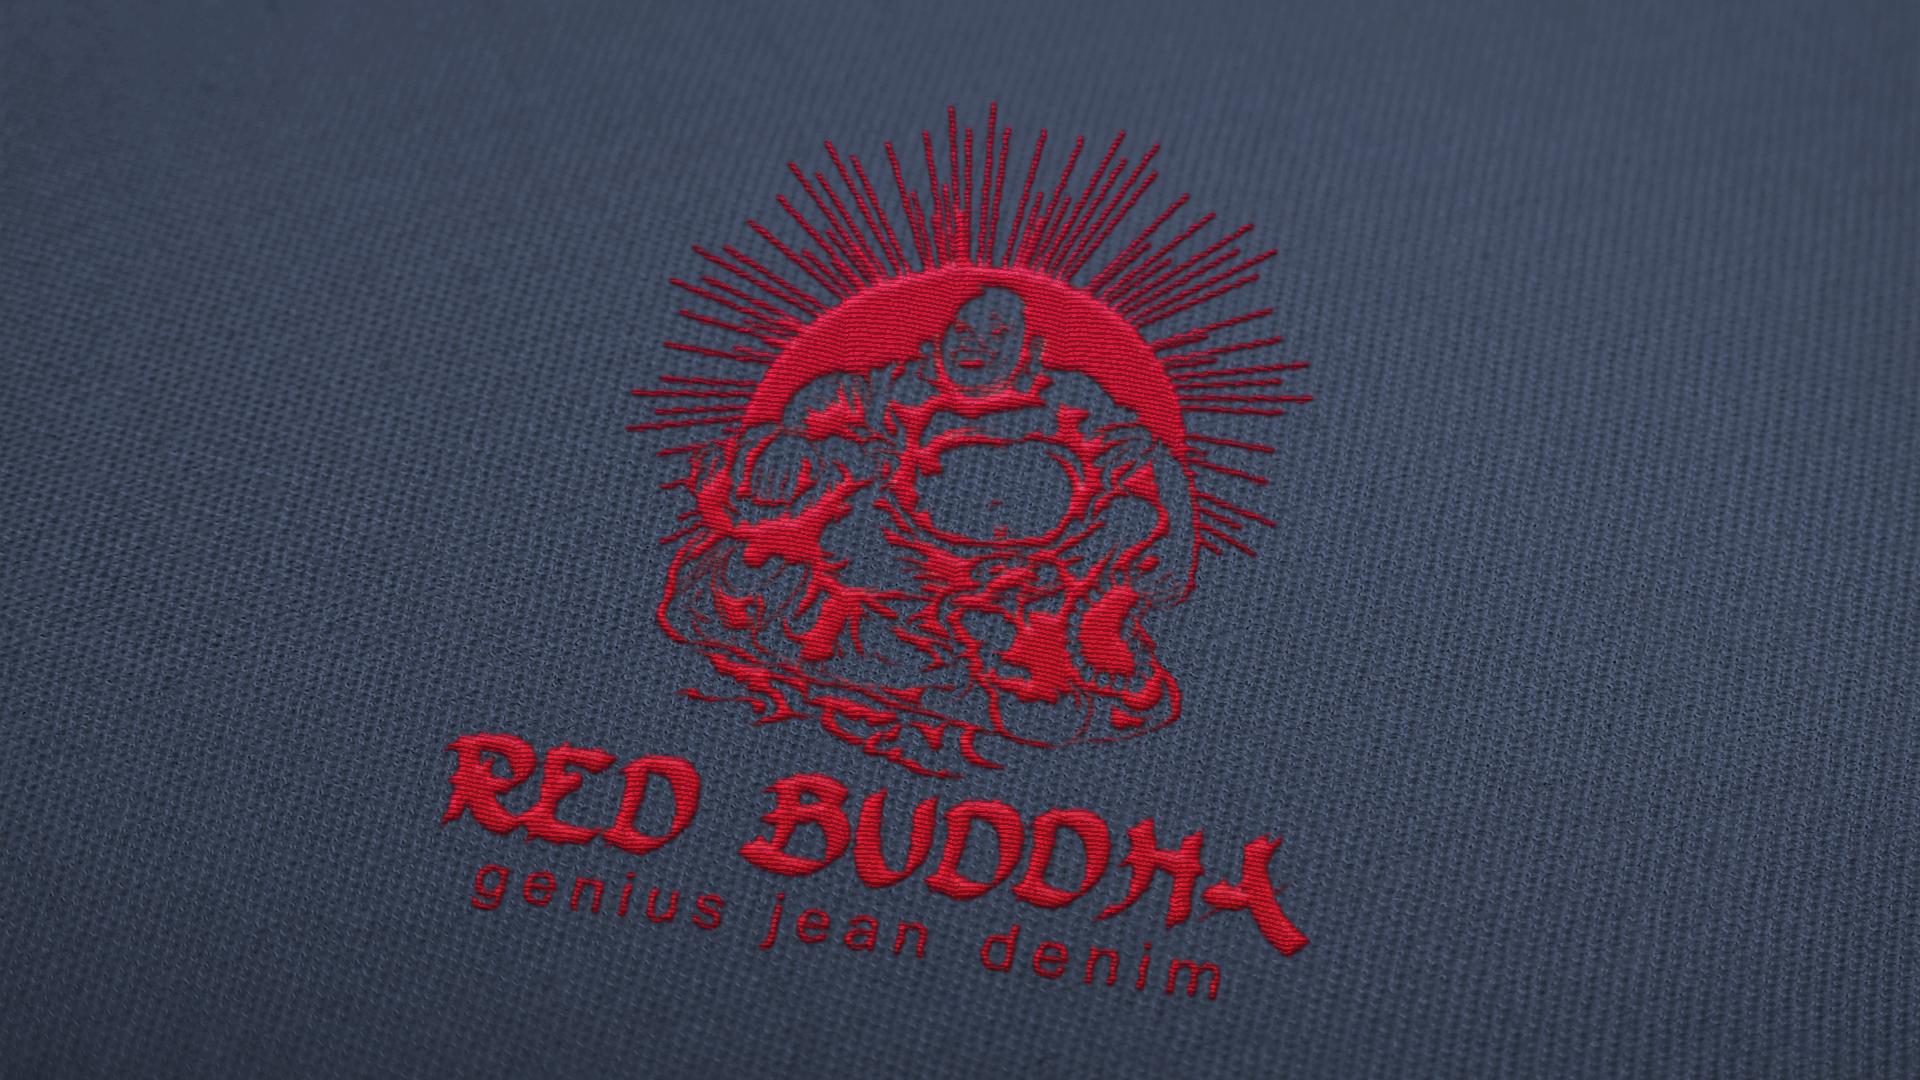 red-buddha-creation-logo-marque-brode-caconcept-alexis-cretin-graphiste-montpellier